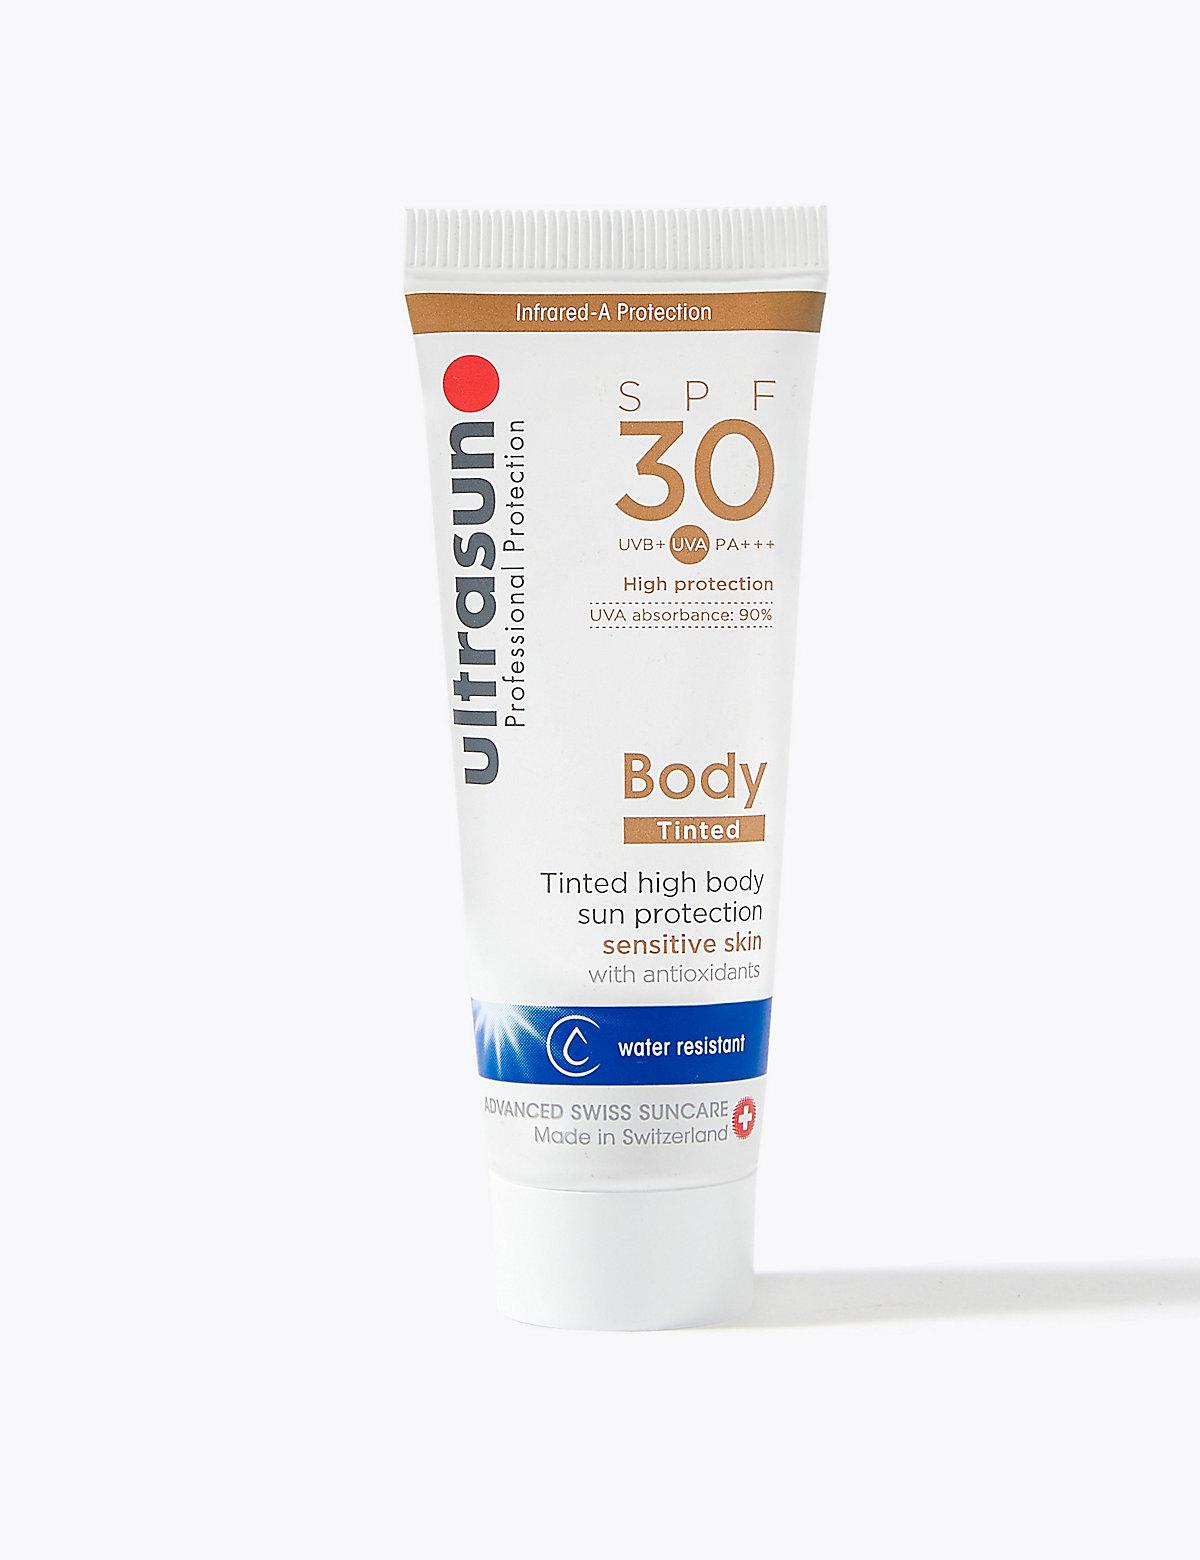 Ultrasun Body Tinted SPF 30 25ml